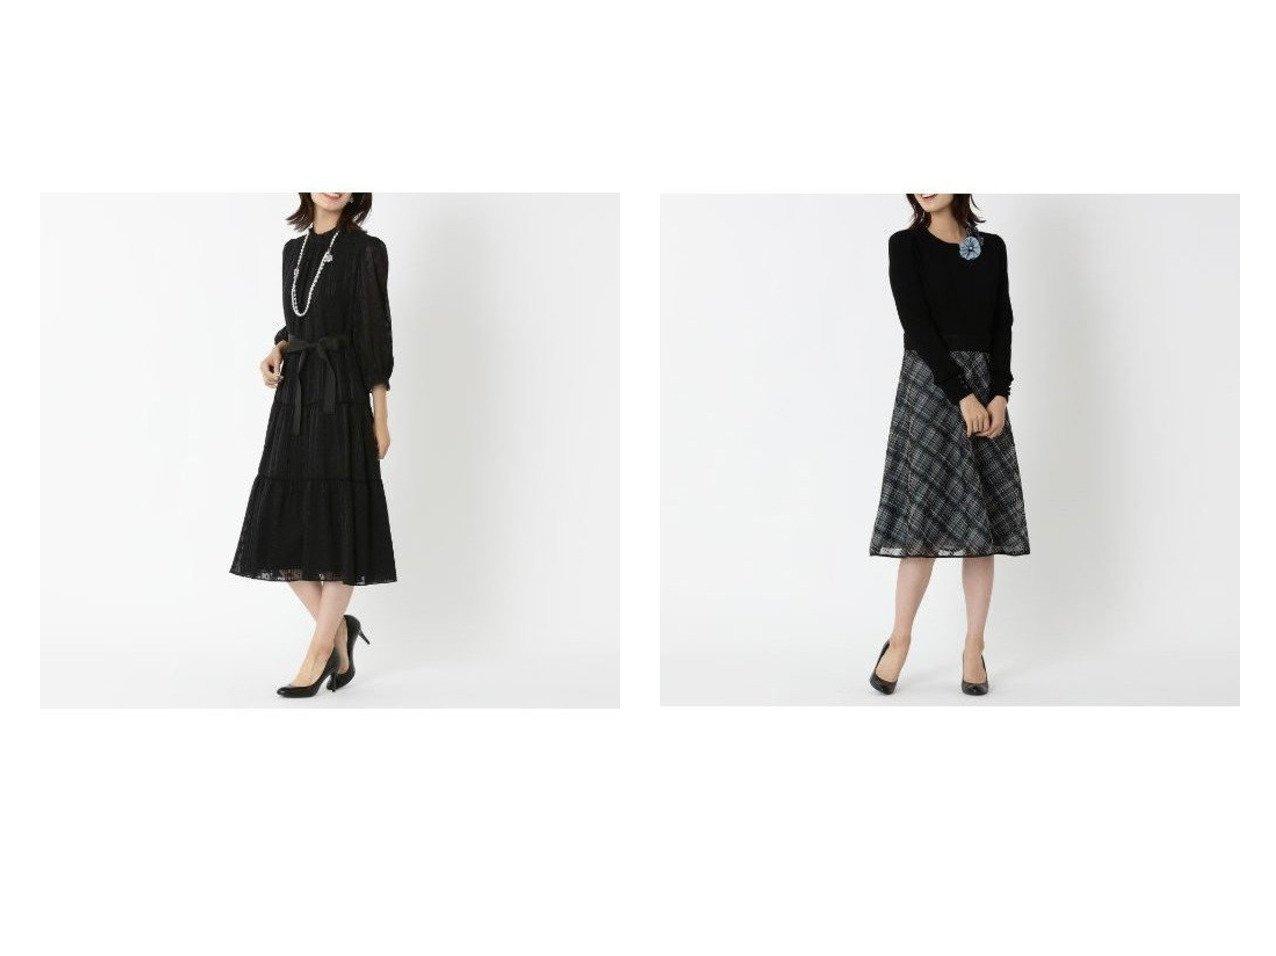 【TO BE CHIC/トゥー ビー シック】のストライプカットジャカード ドレス&エンブロイダリーチェックコンビ ドレス おすすめ!人気、トレンド・レディースファッションの通販 おすすめで人気の流行・トレンド、ファッションの通販商品 インテリア・家具・メンズファッション・キッズファッション・レディースファッション・服の通販 founy(ファニー) https://founy.com/ ファッション Fashion レディースファッション WOMEN ワンピース Dress ドレス Party Dresses ギャザー グログラン シフォン ジャカード ジョーゼット ドレス フェミニン フォーマル フリル リボン オーガンジー サテン シャンブレー チェック フィット フレア 定番 Standard |ID:crp329100000072375